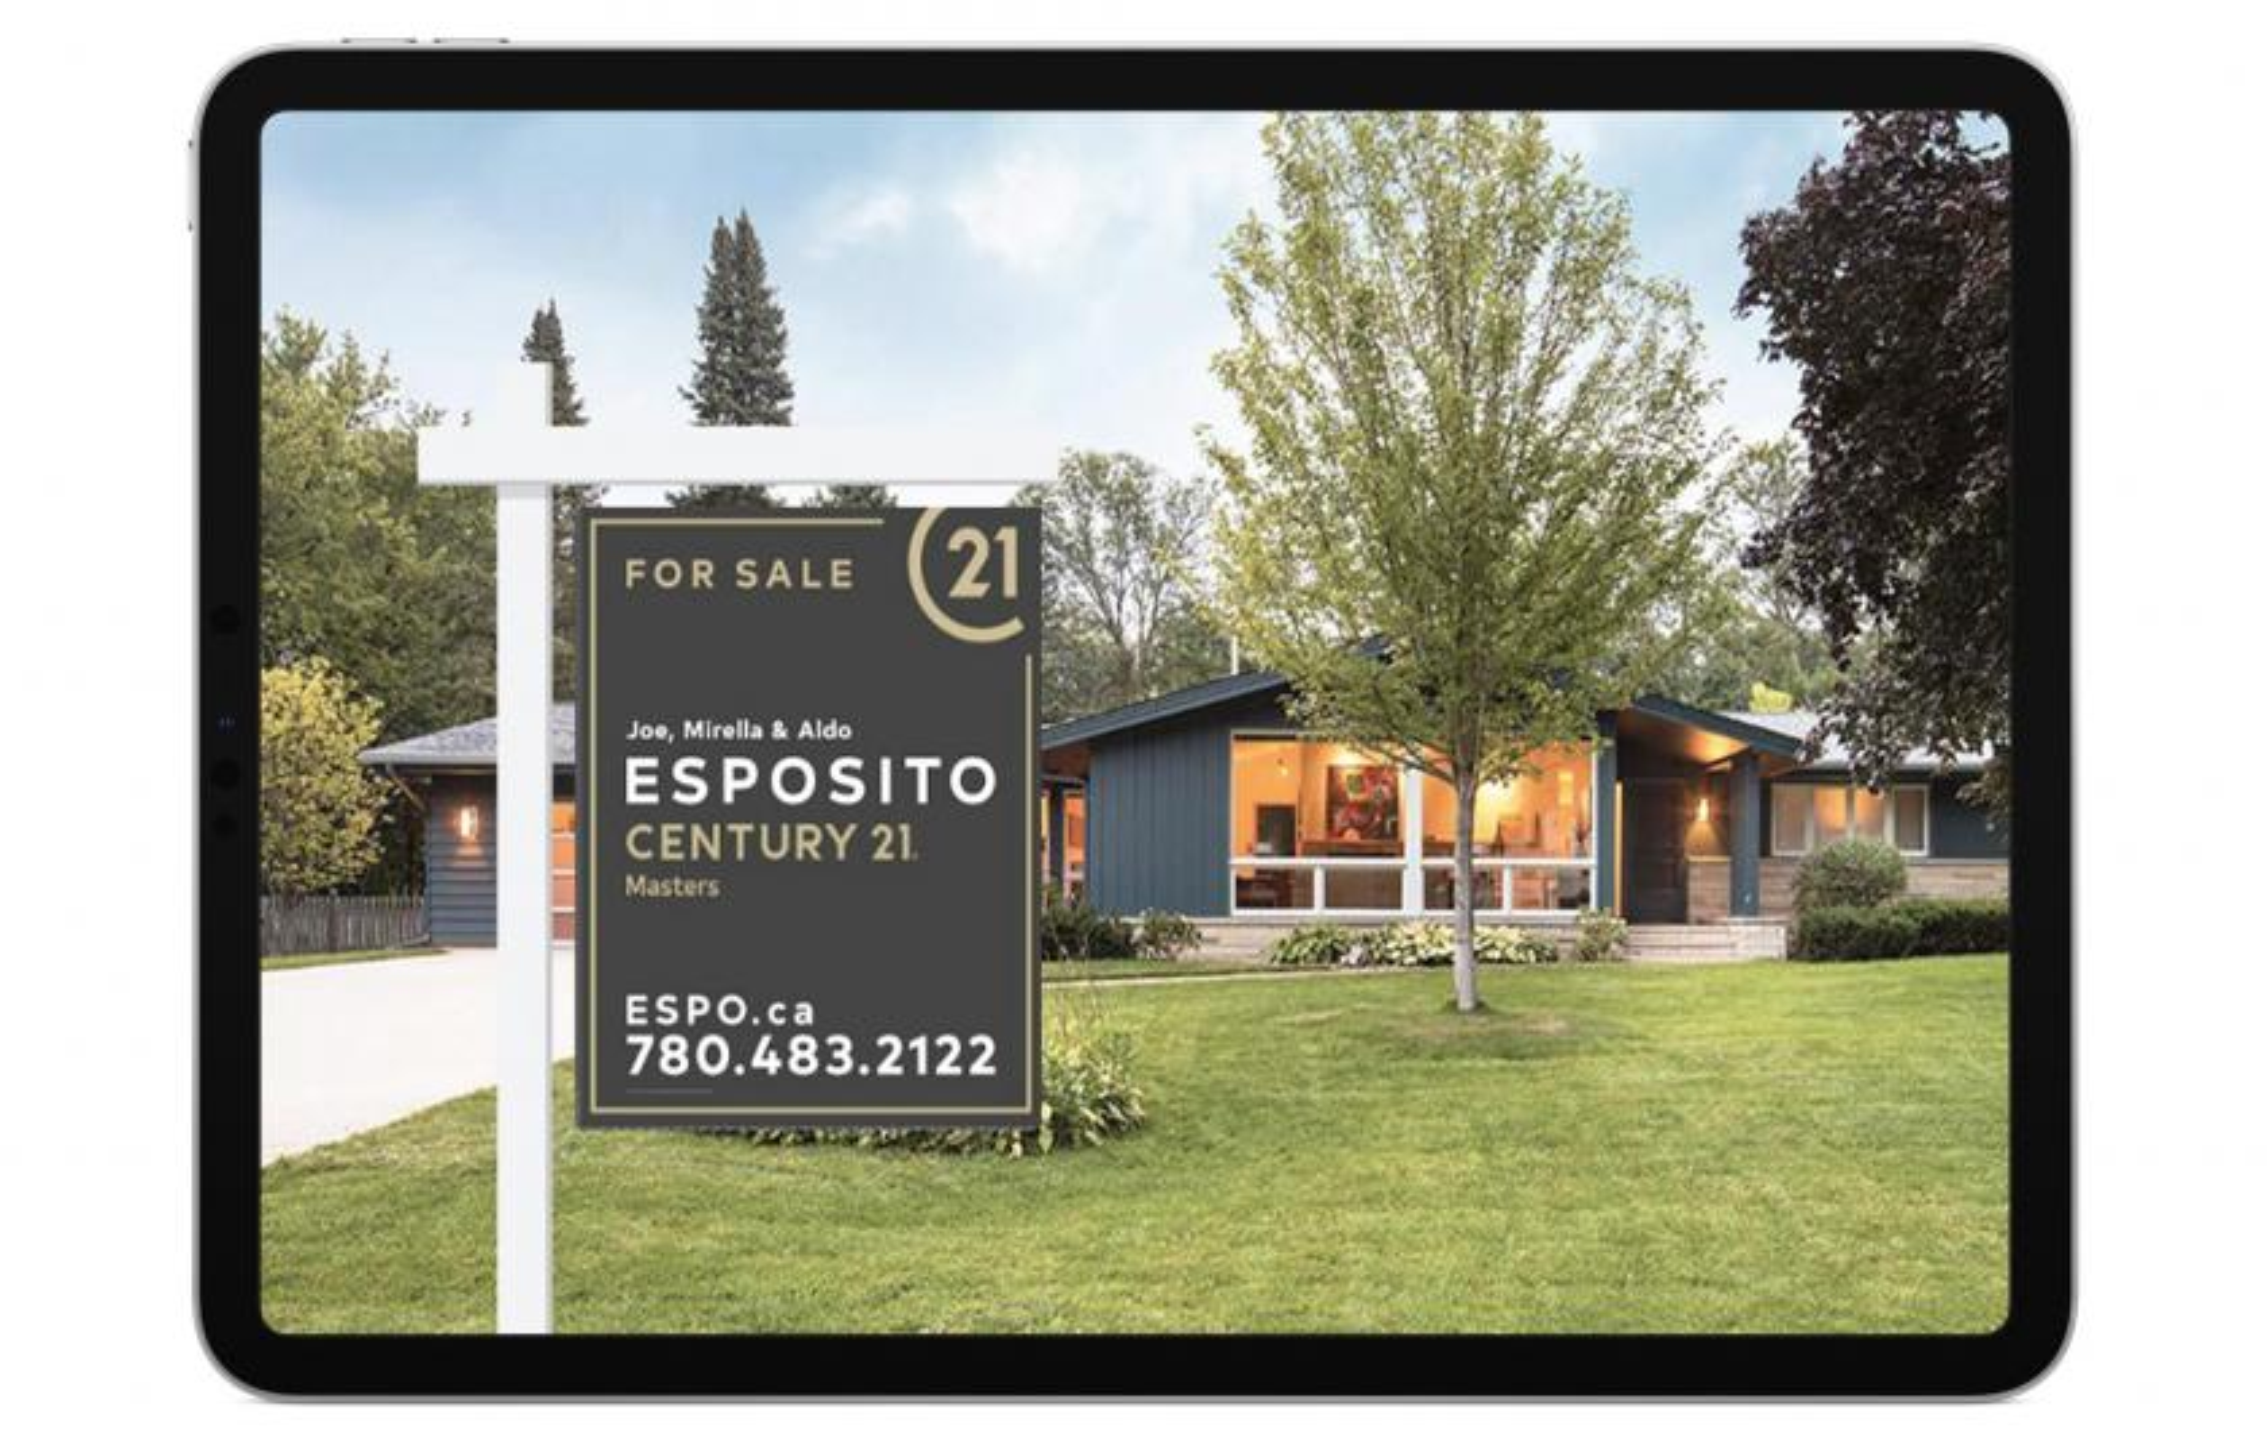 Esposito real estate open house sign